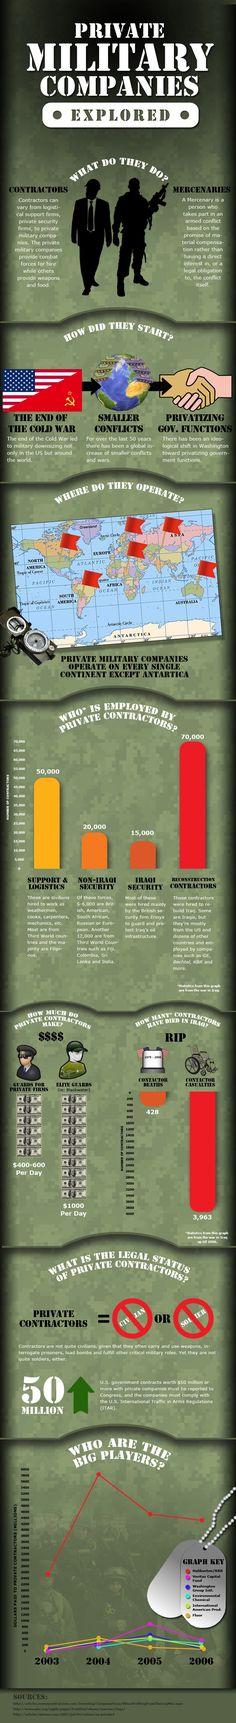 Private Military Companies Explored.